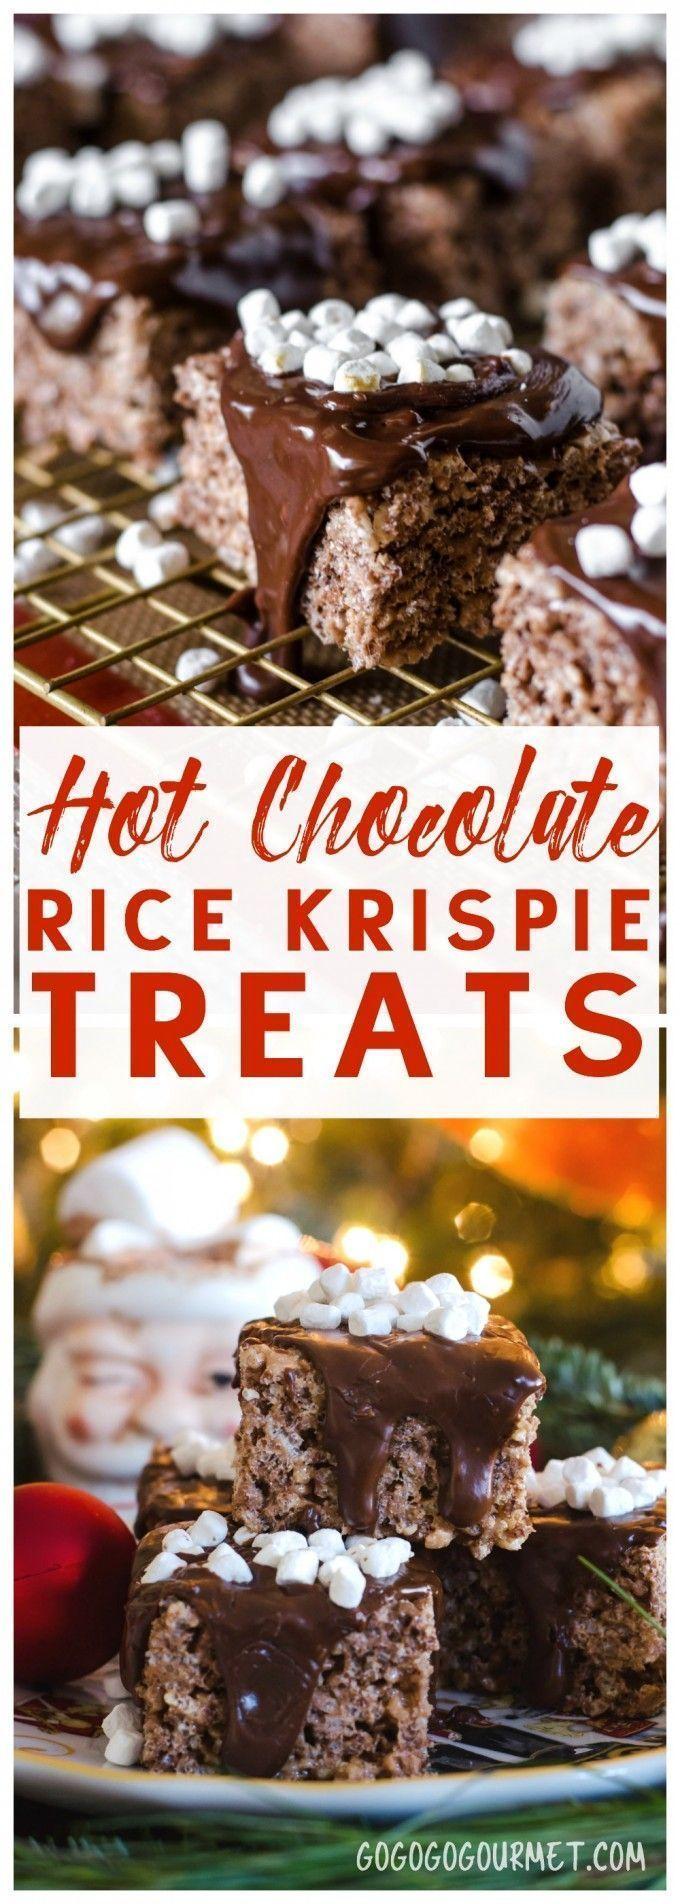 Hot Chocolate Rice Krispies:registered: Treats- a fast and easy holiday no-bake treat!!  via /gogogogourmet/ #ad HolidayTreatMaking